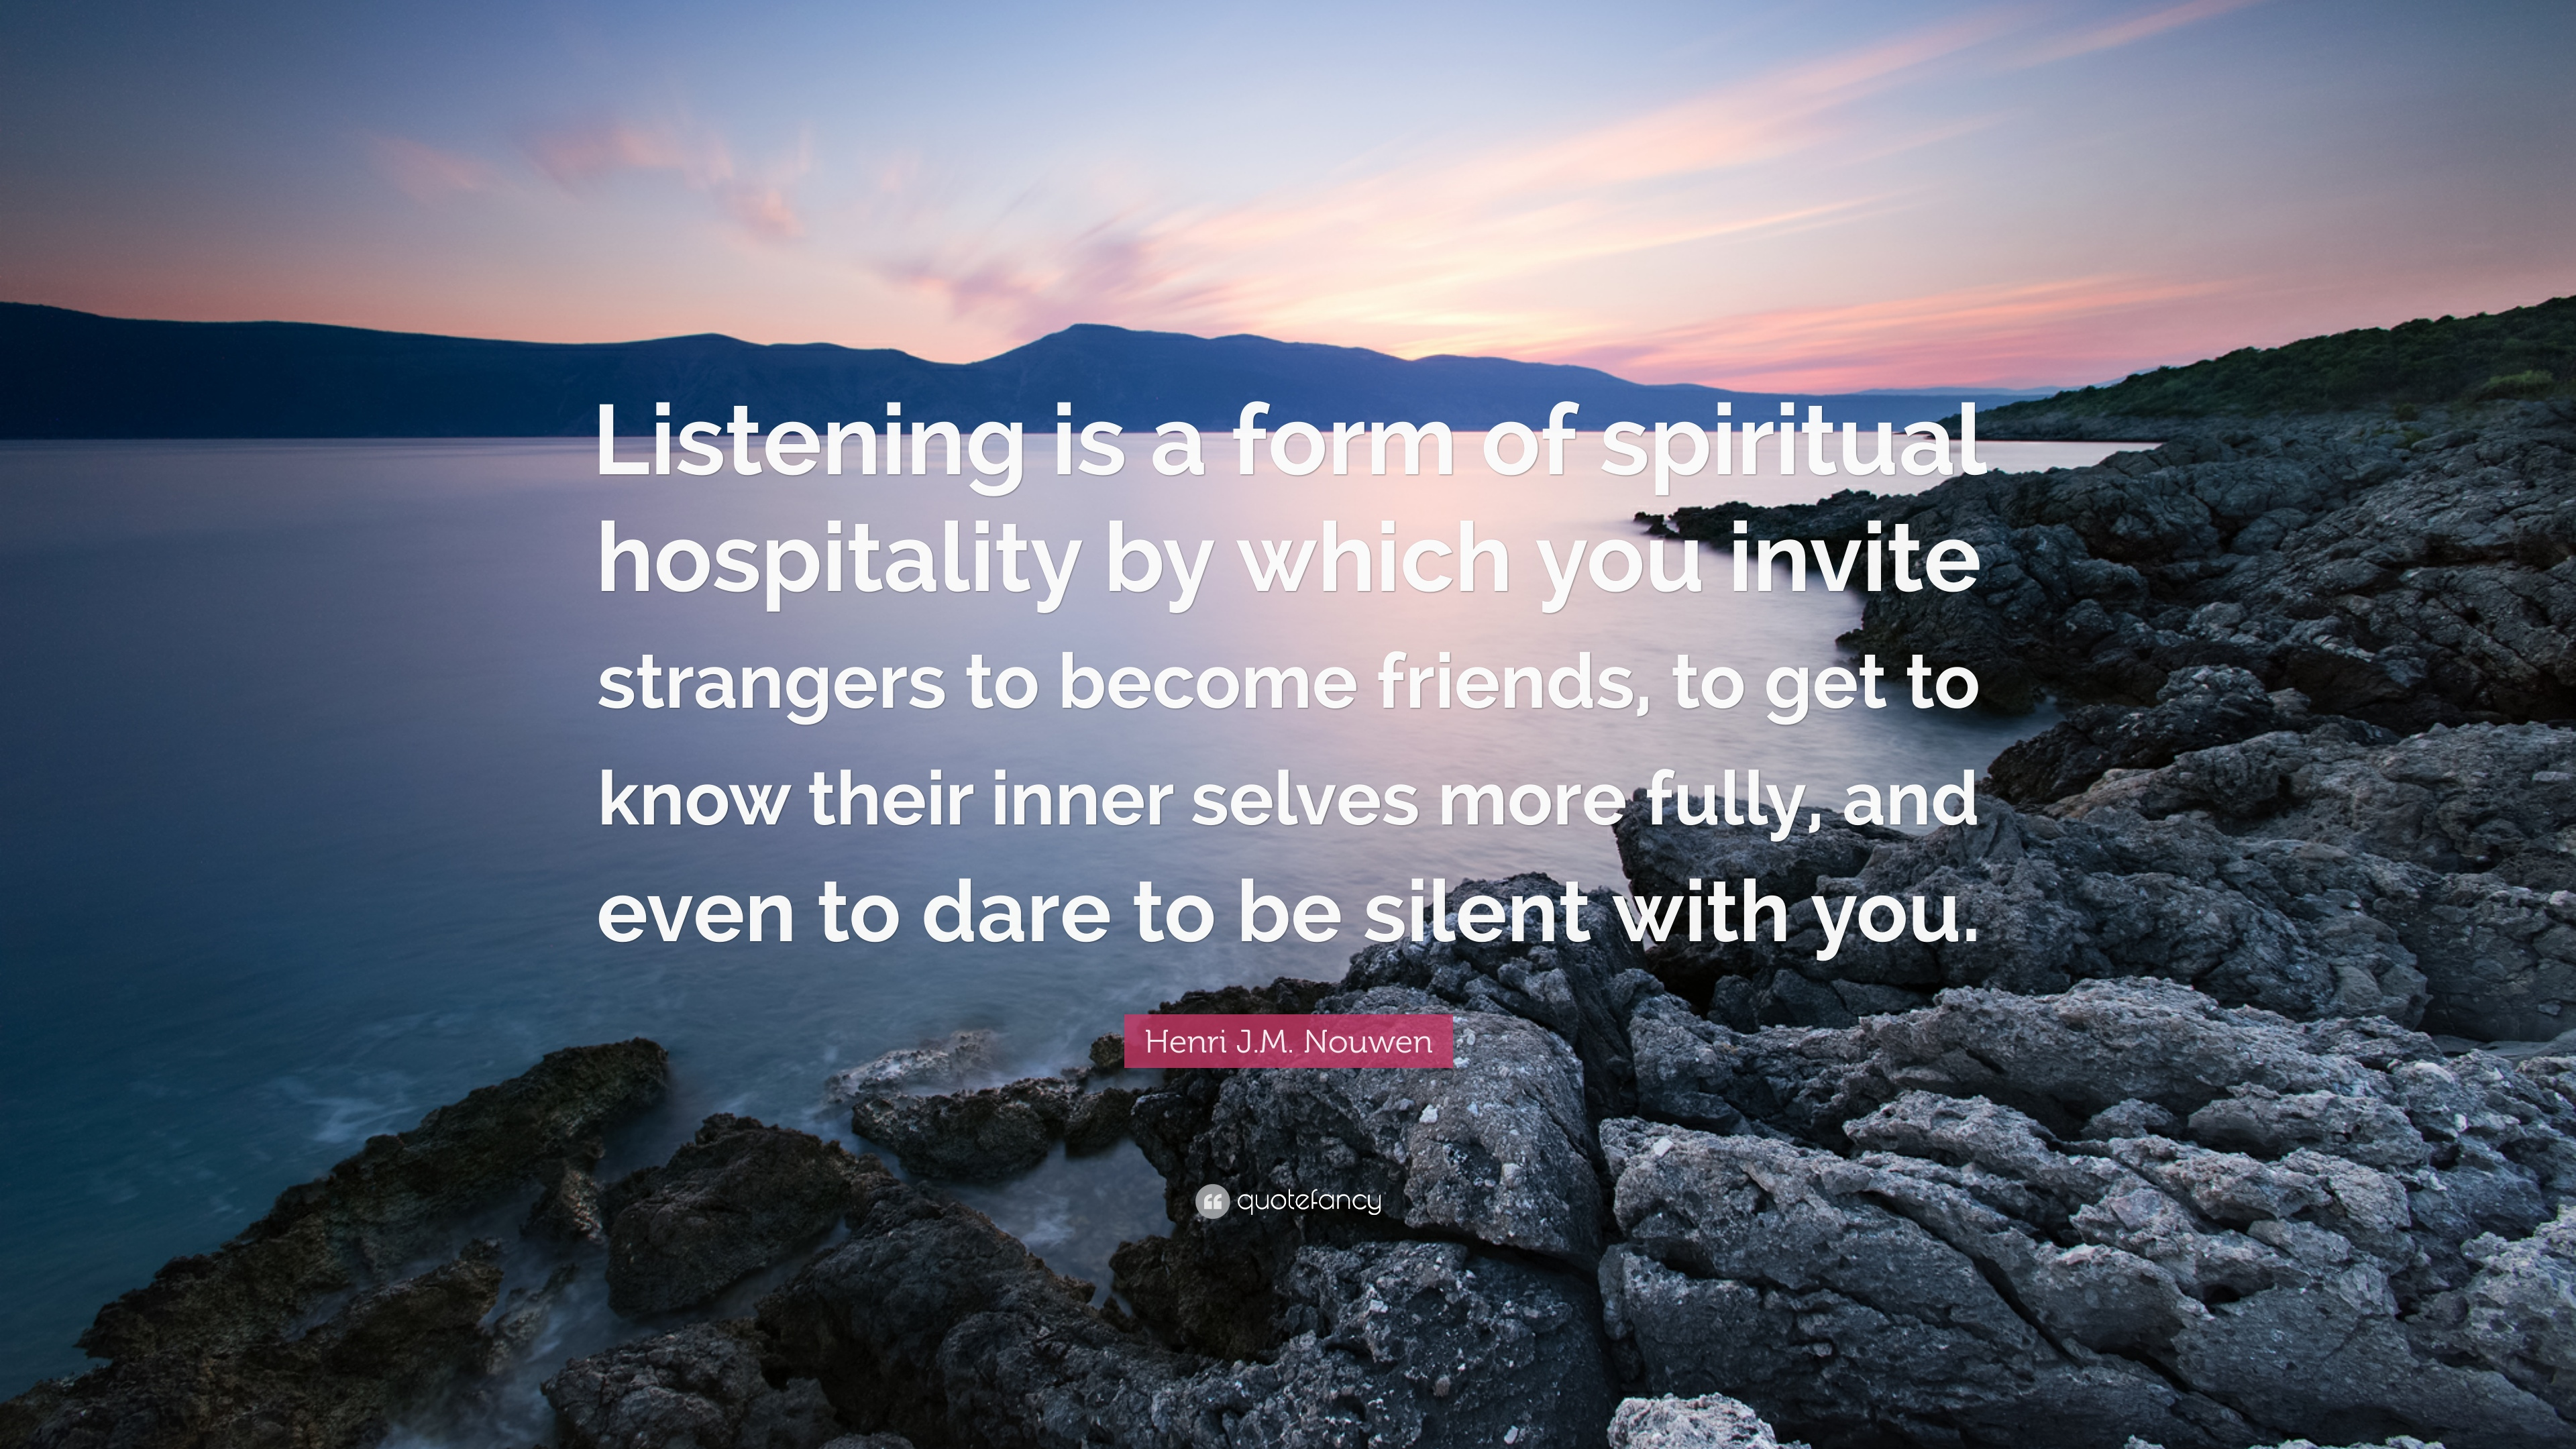 Henri Jm Nouwen Quote Listening Is A Form Of Spiritual